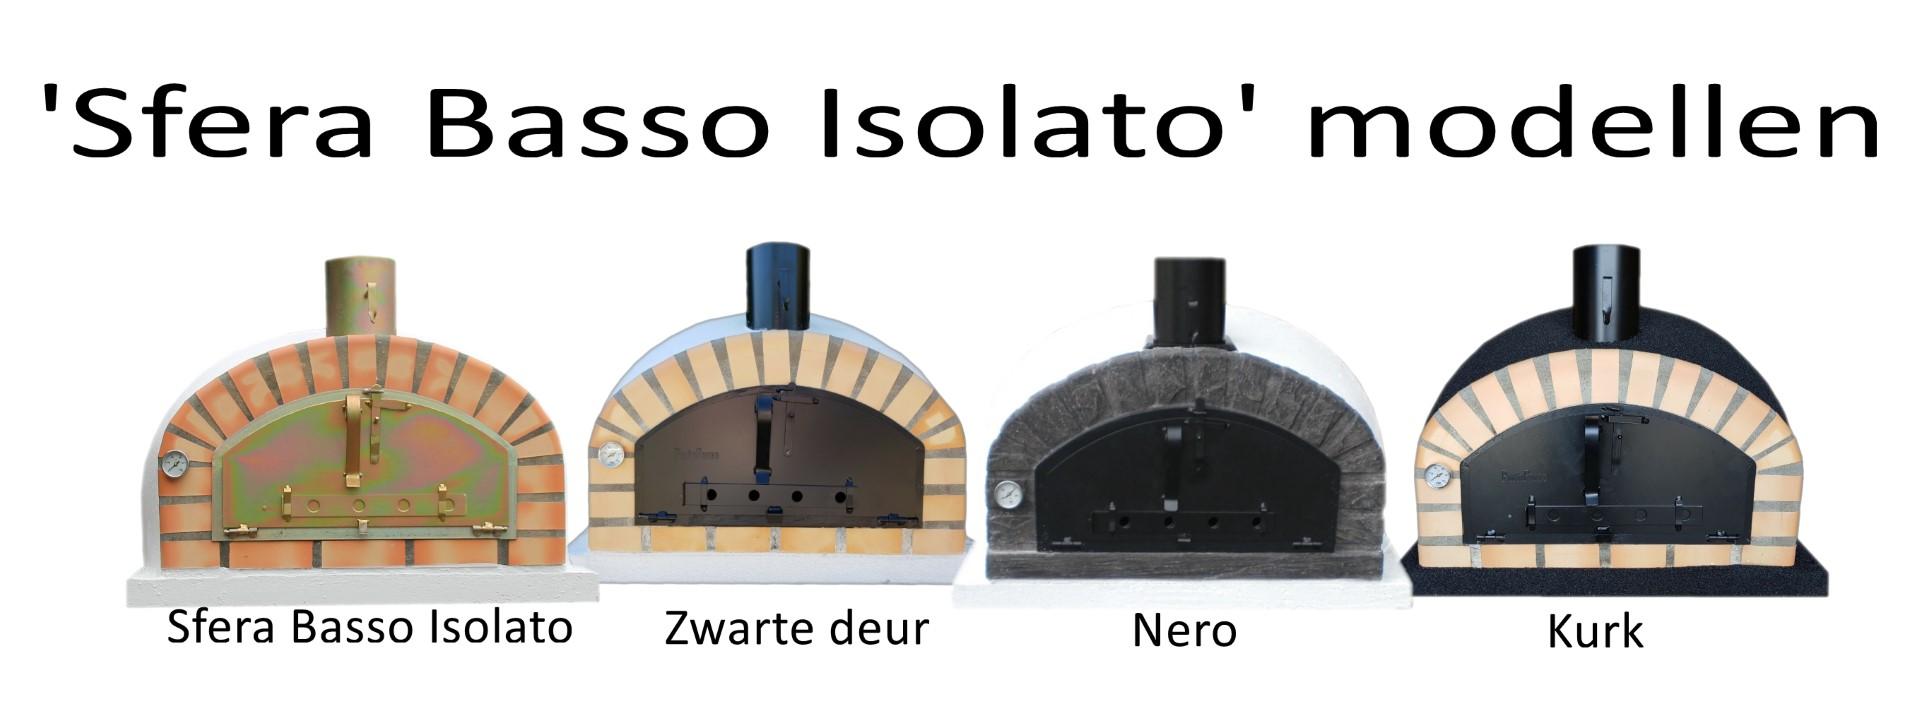 Steenovens modellen Sfera Basso Isolato